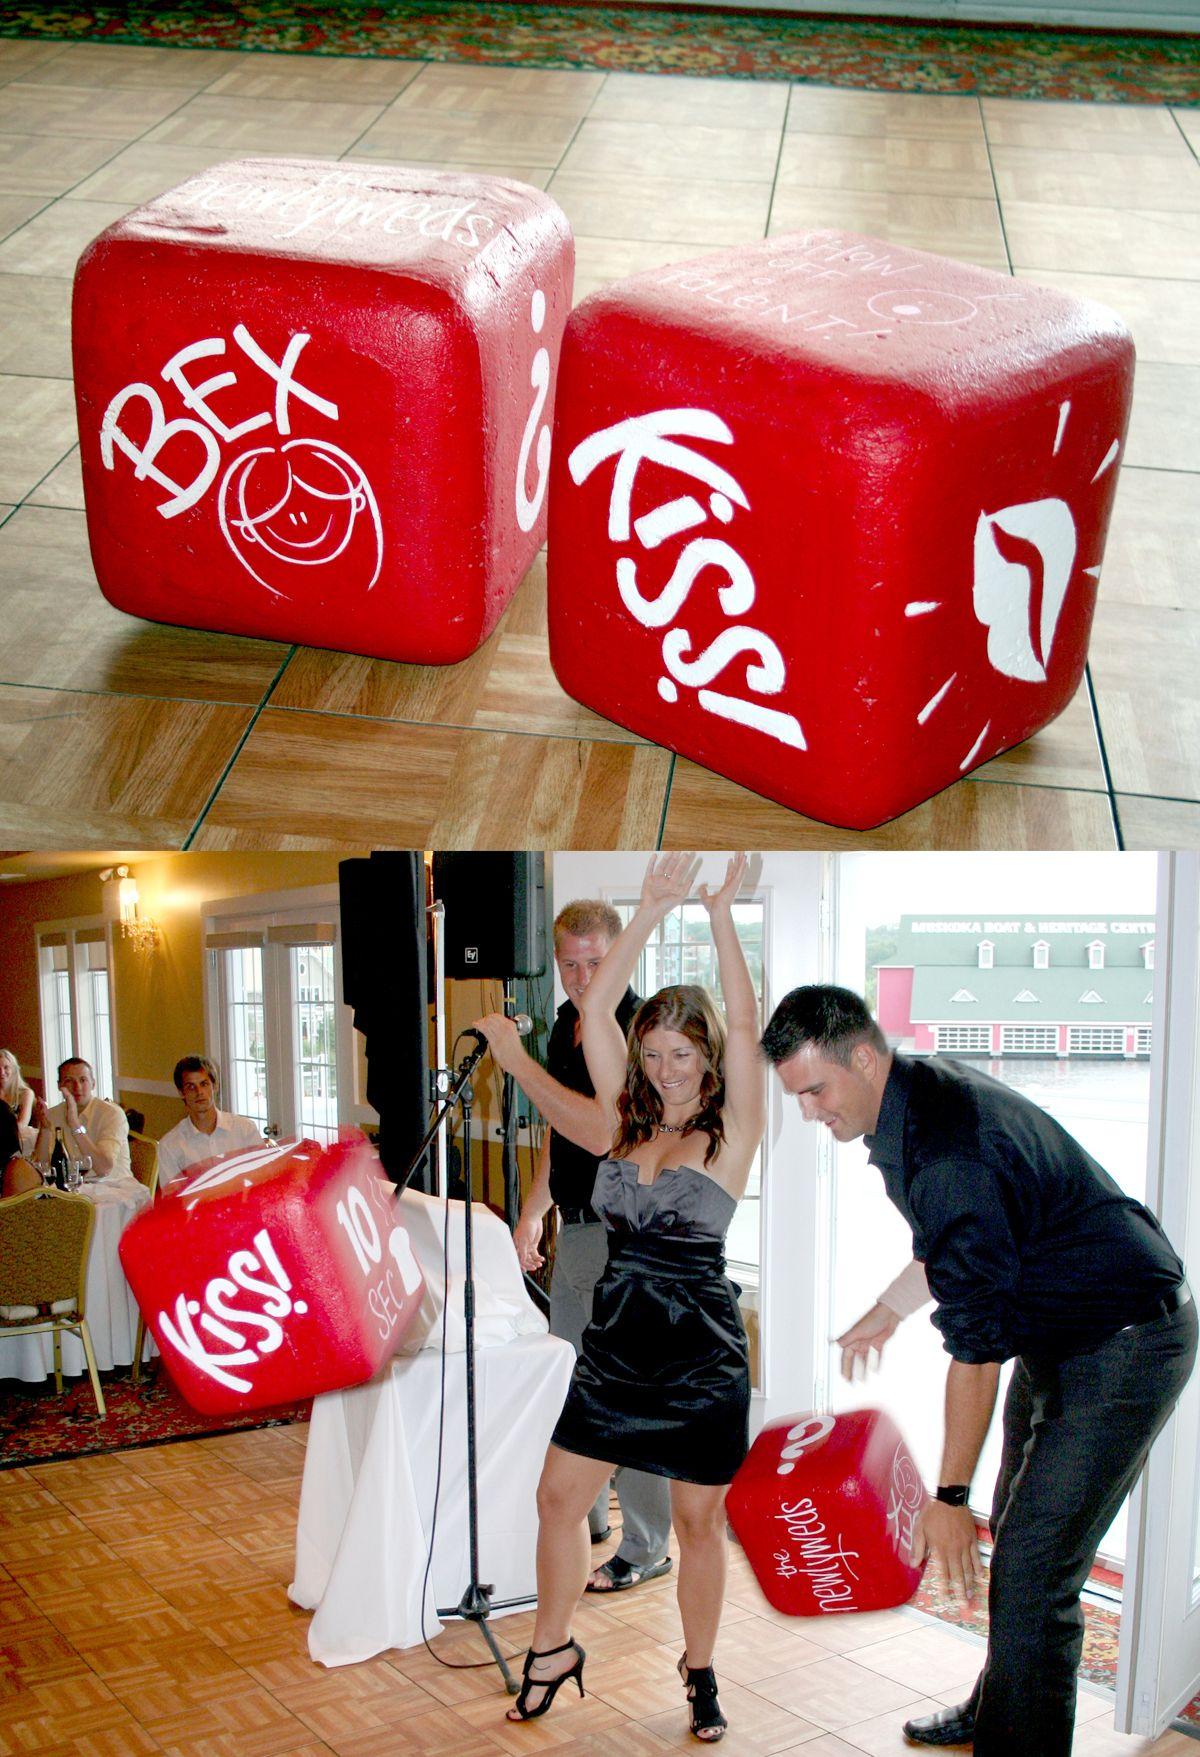 Fun big wedding dice made from Styrofoam!  great game!